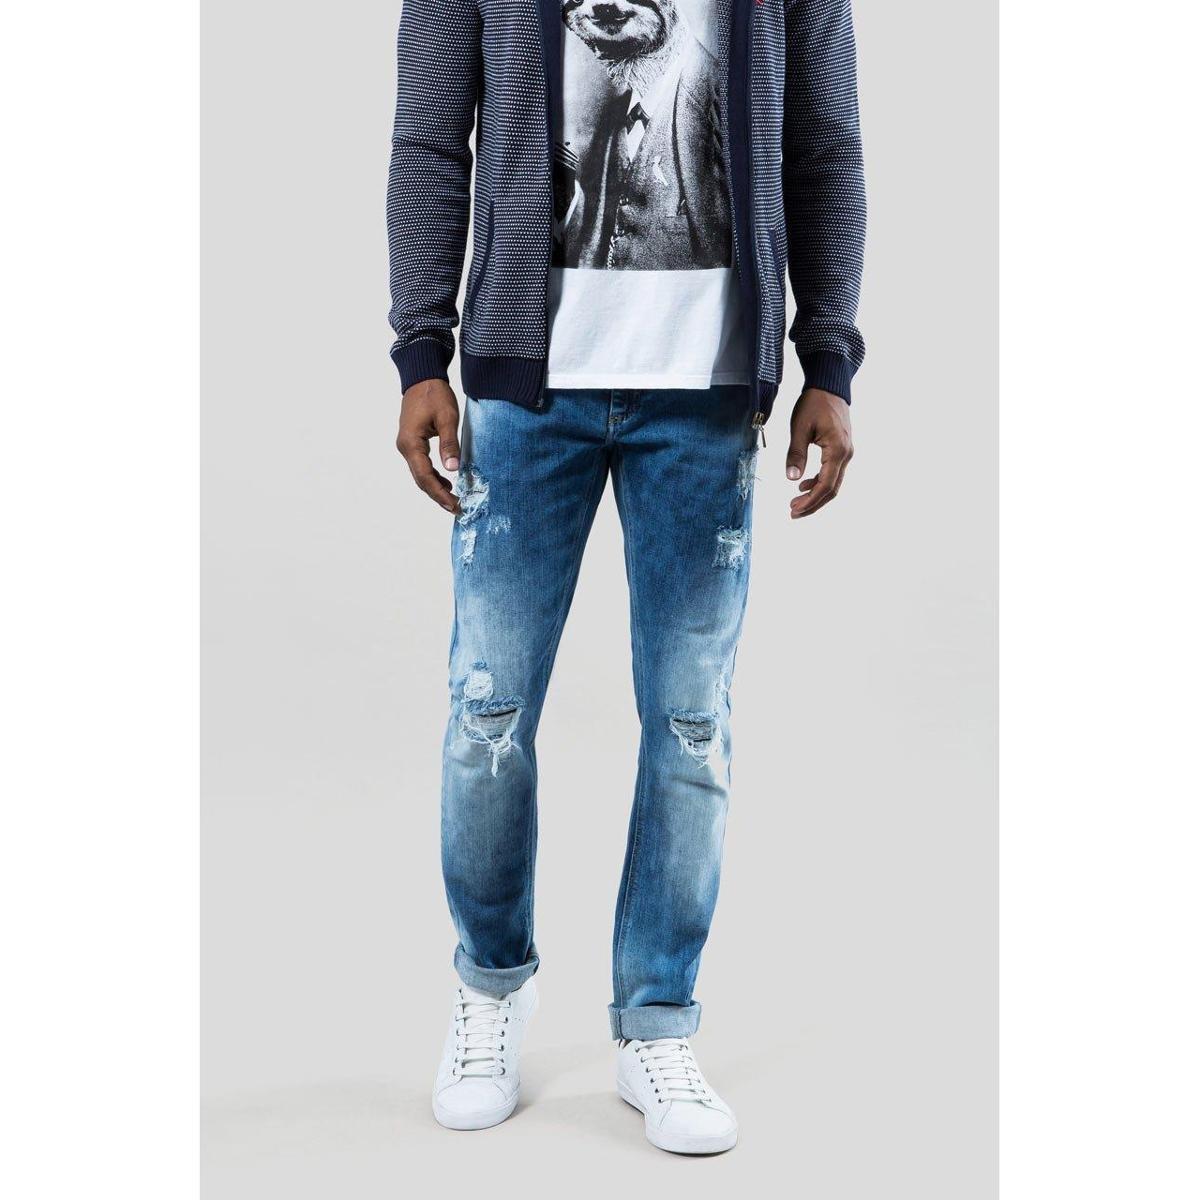 021233f1d Calca Jeans +5561 Ceres Claro Reserva Masculina - Jeans - Compre Agora